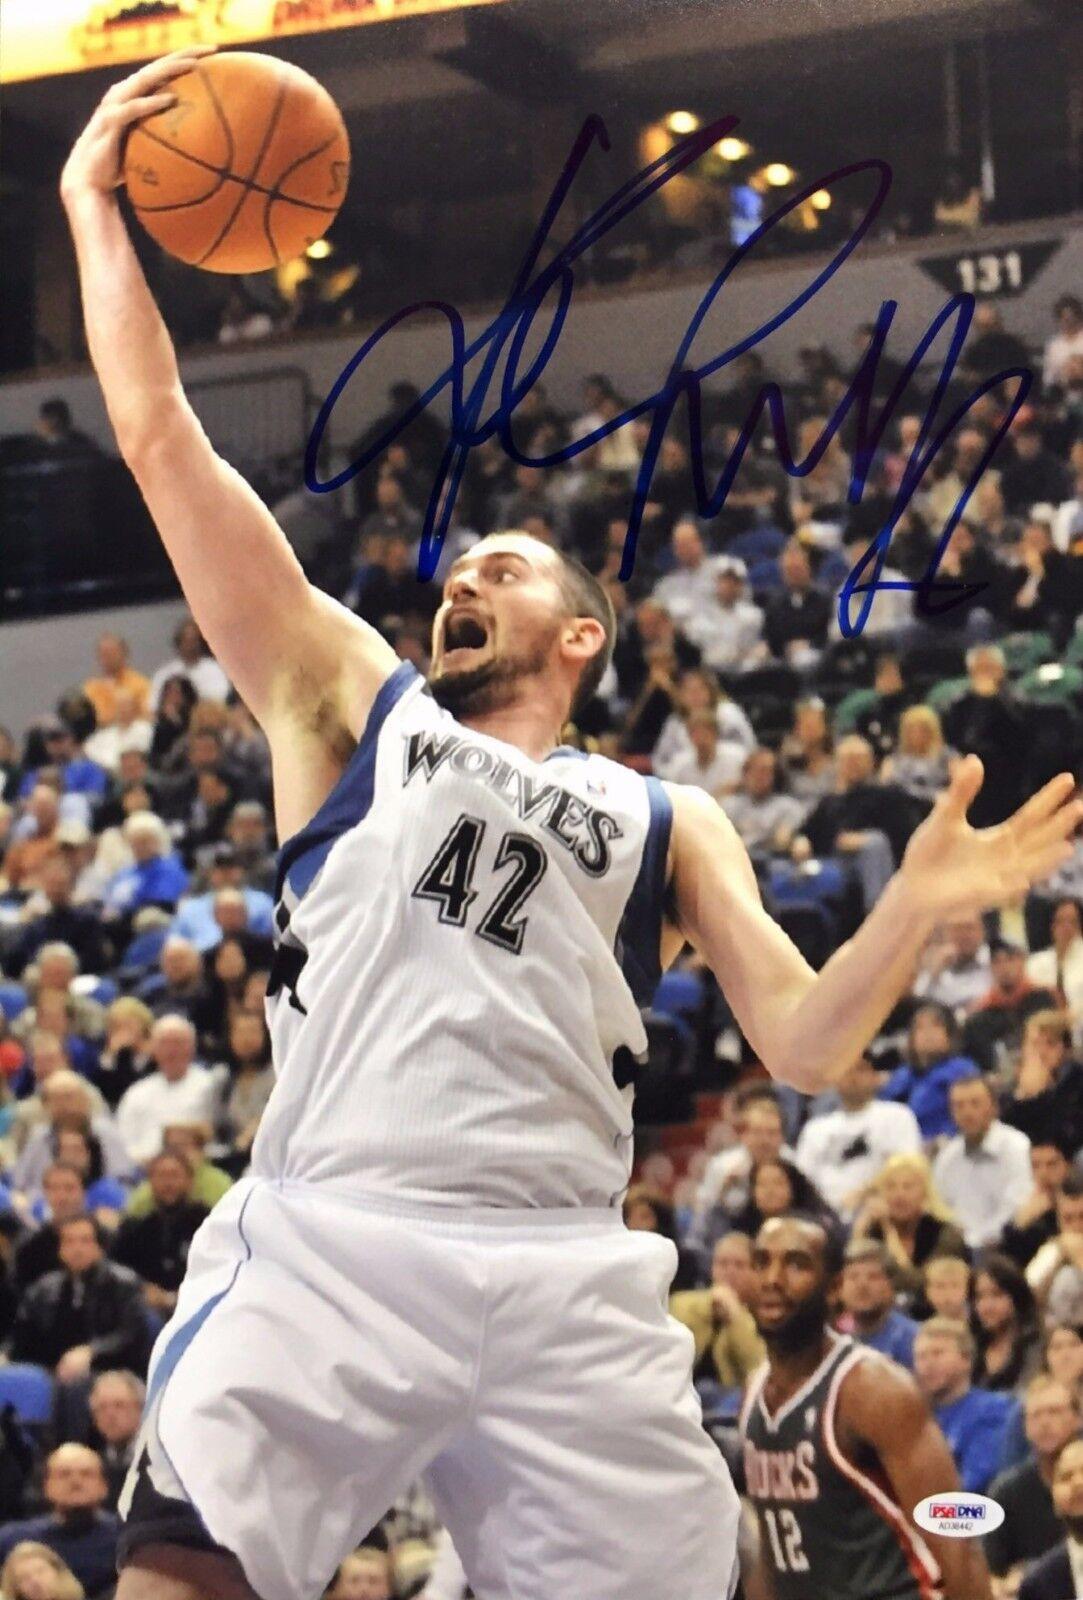 Kevin Love Signed Minnesota Timberwolves Basketball 12x18 Photo PSA AD38442